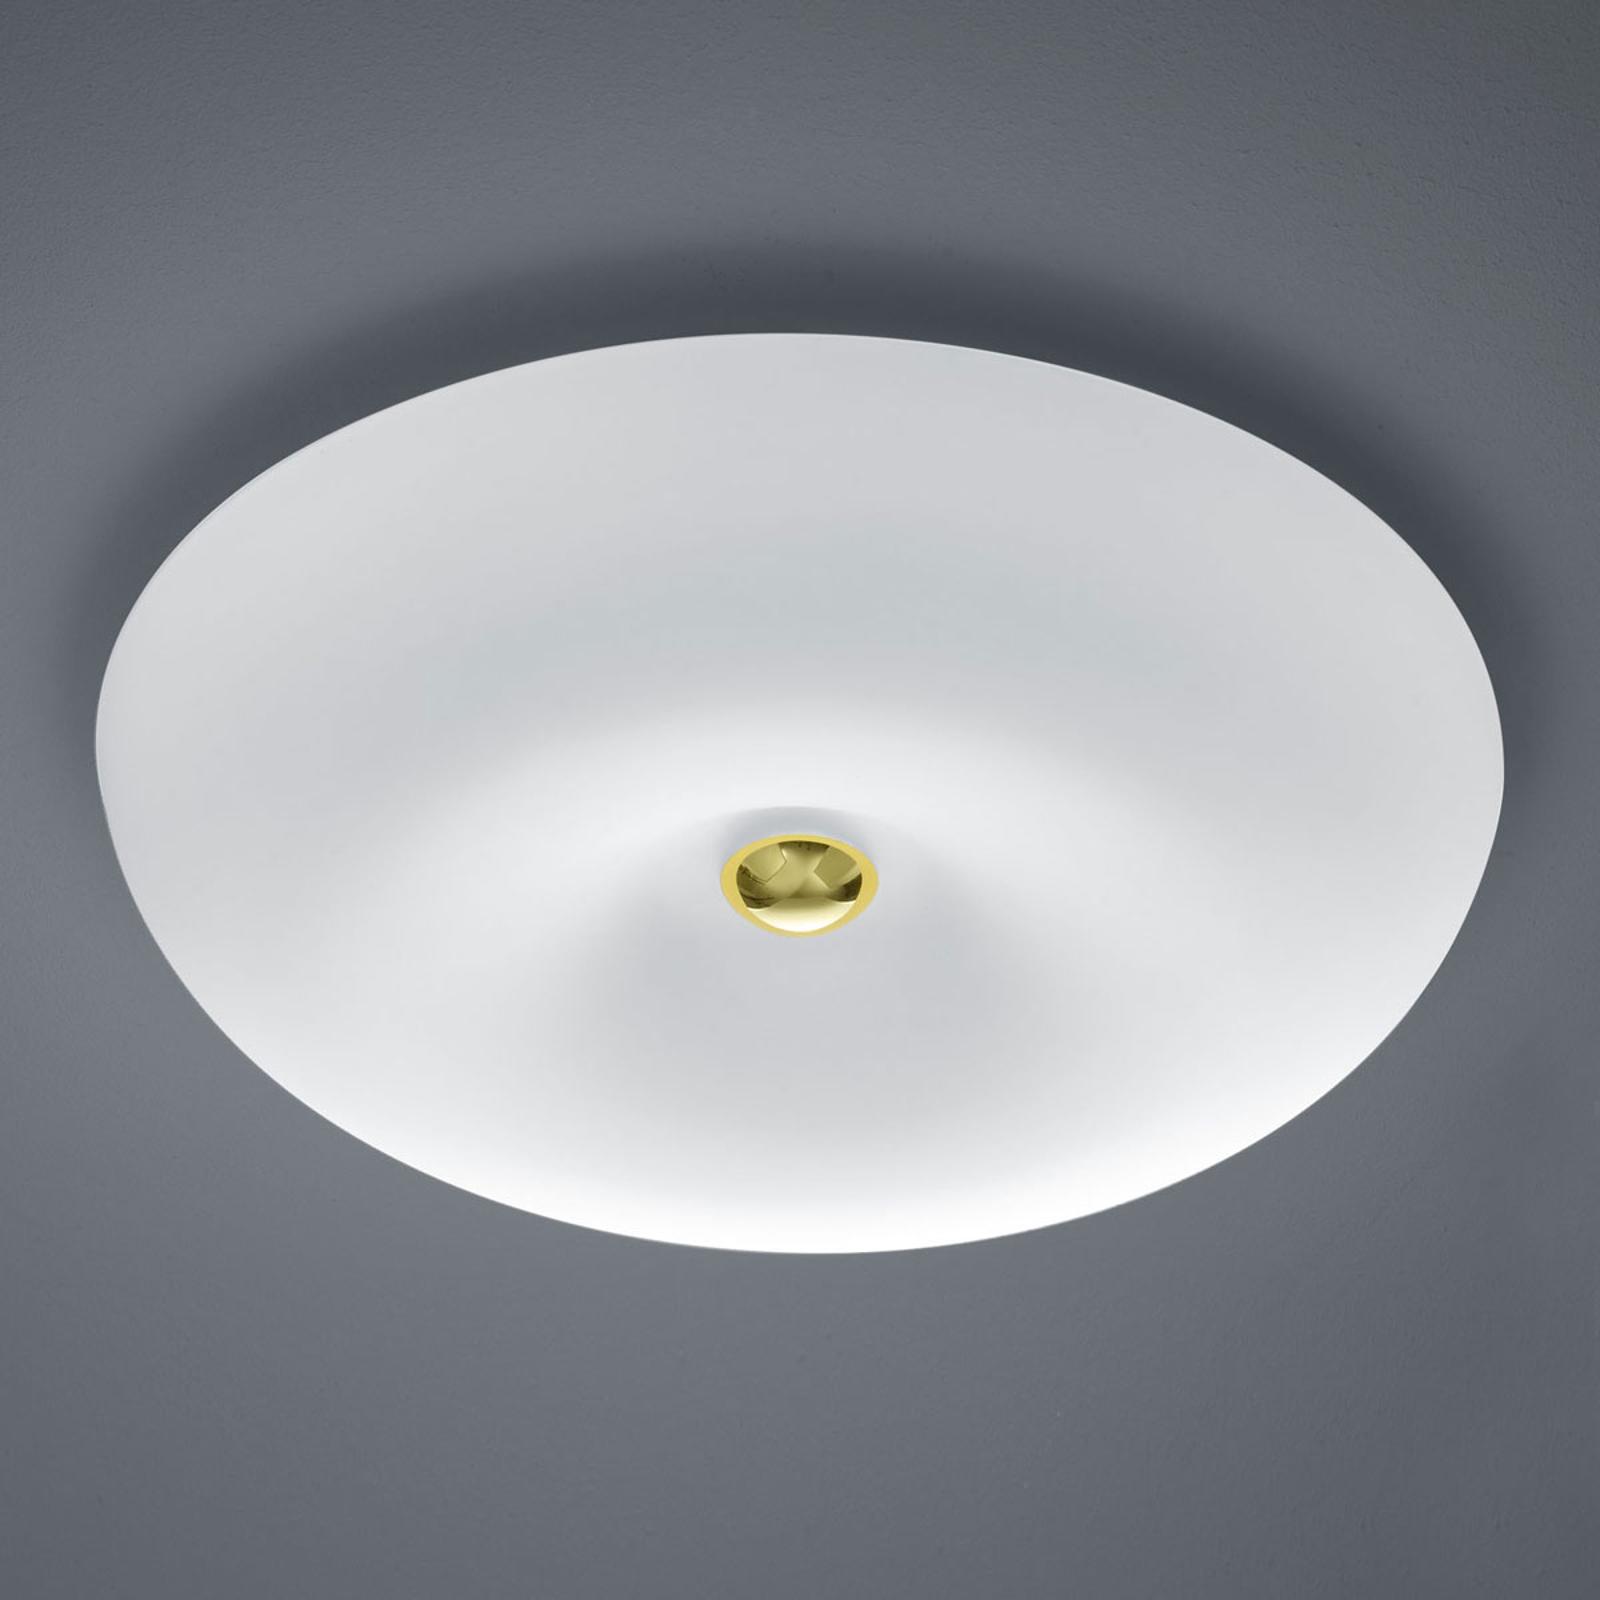 BANKAMP Vanity szklana lampa sufitowa LED, mosiądz